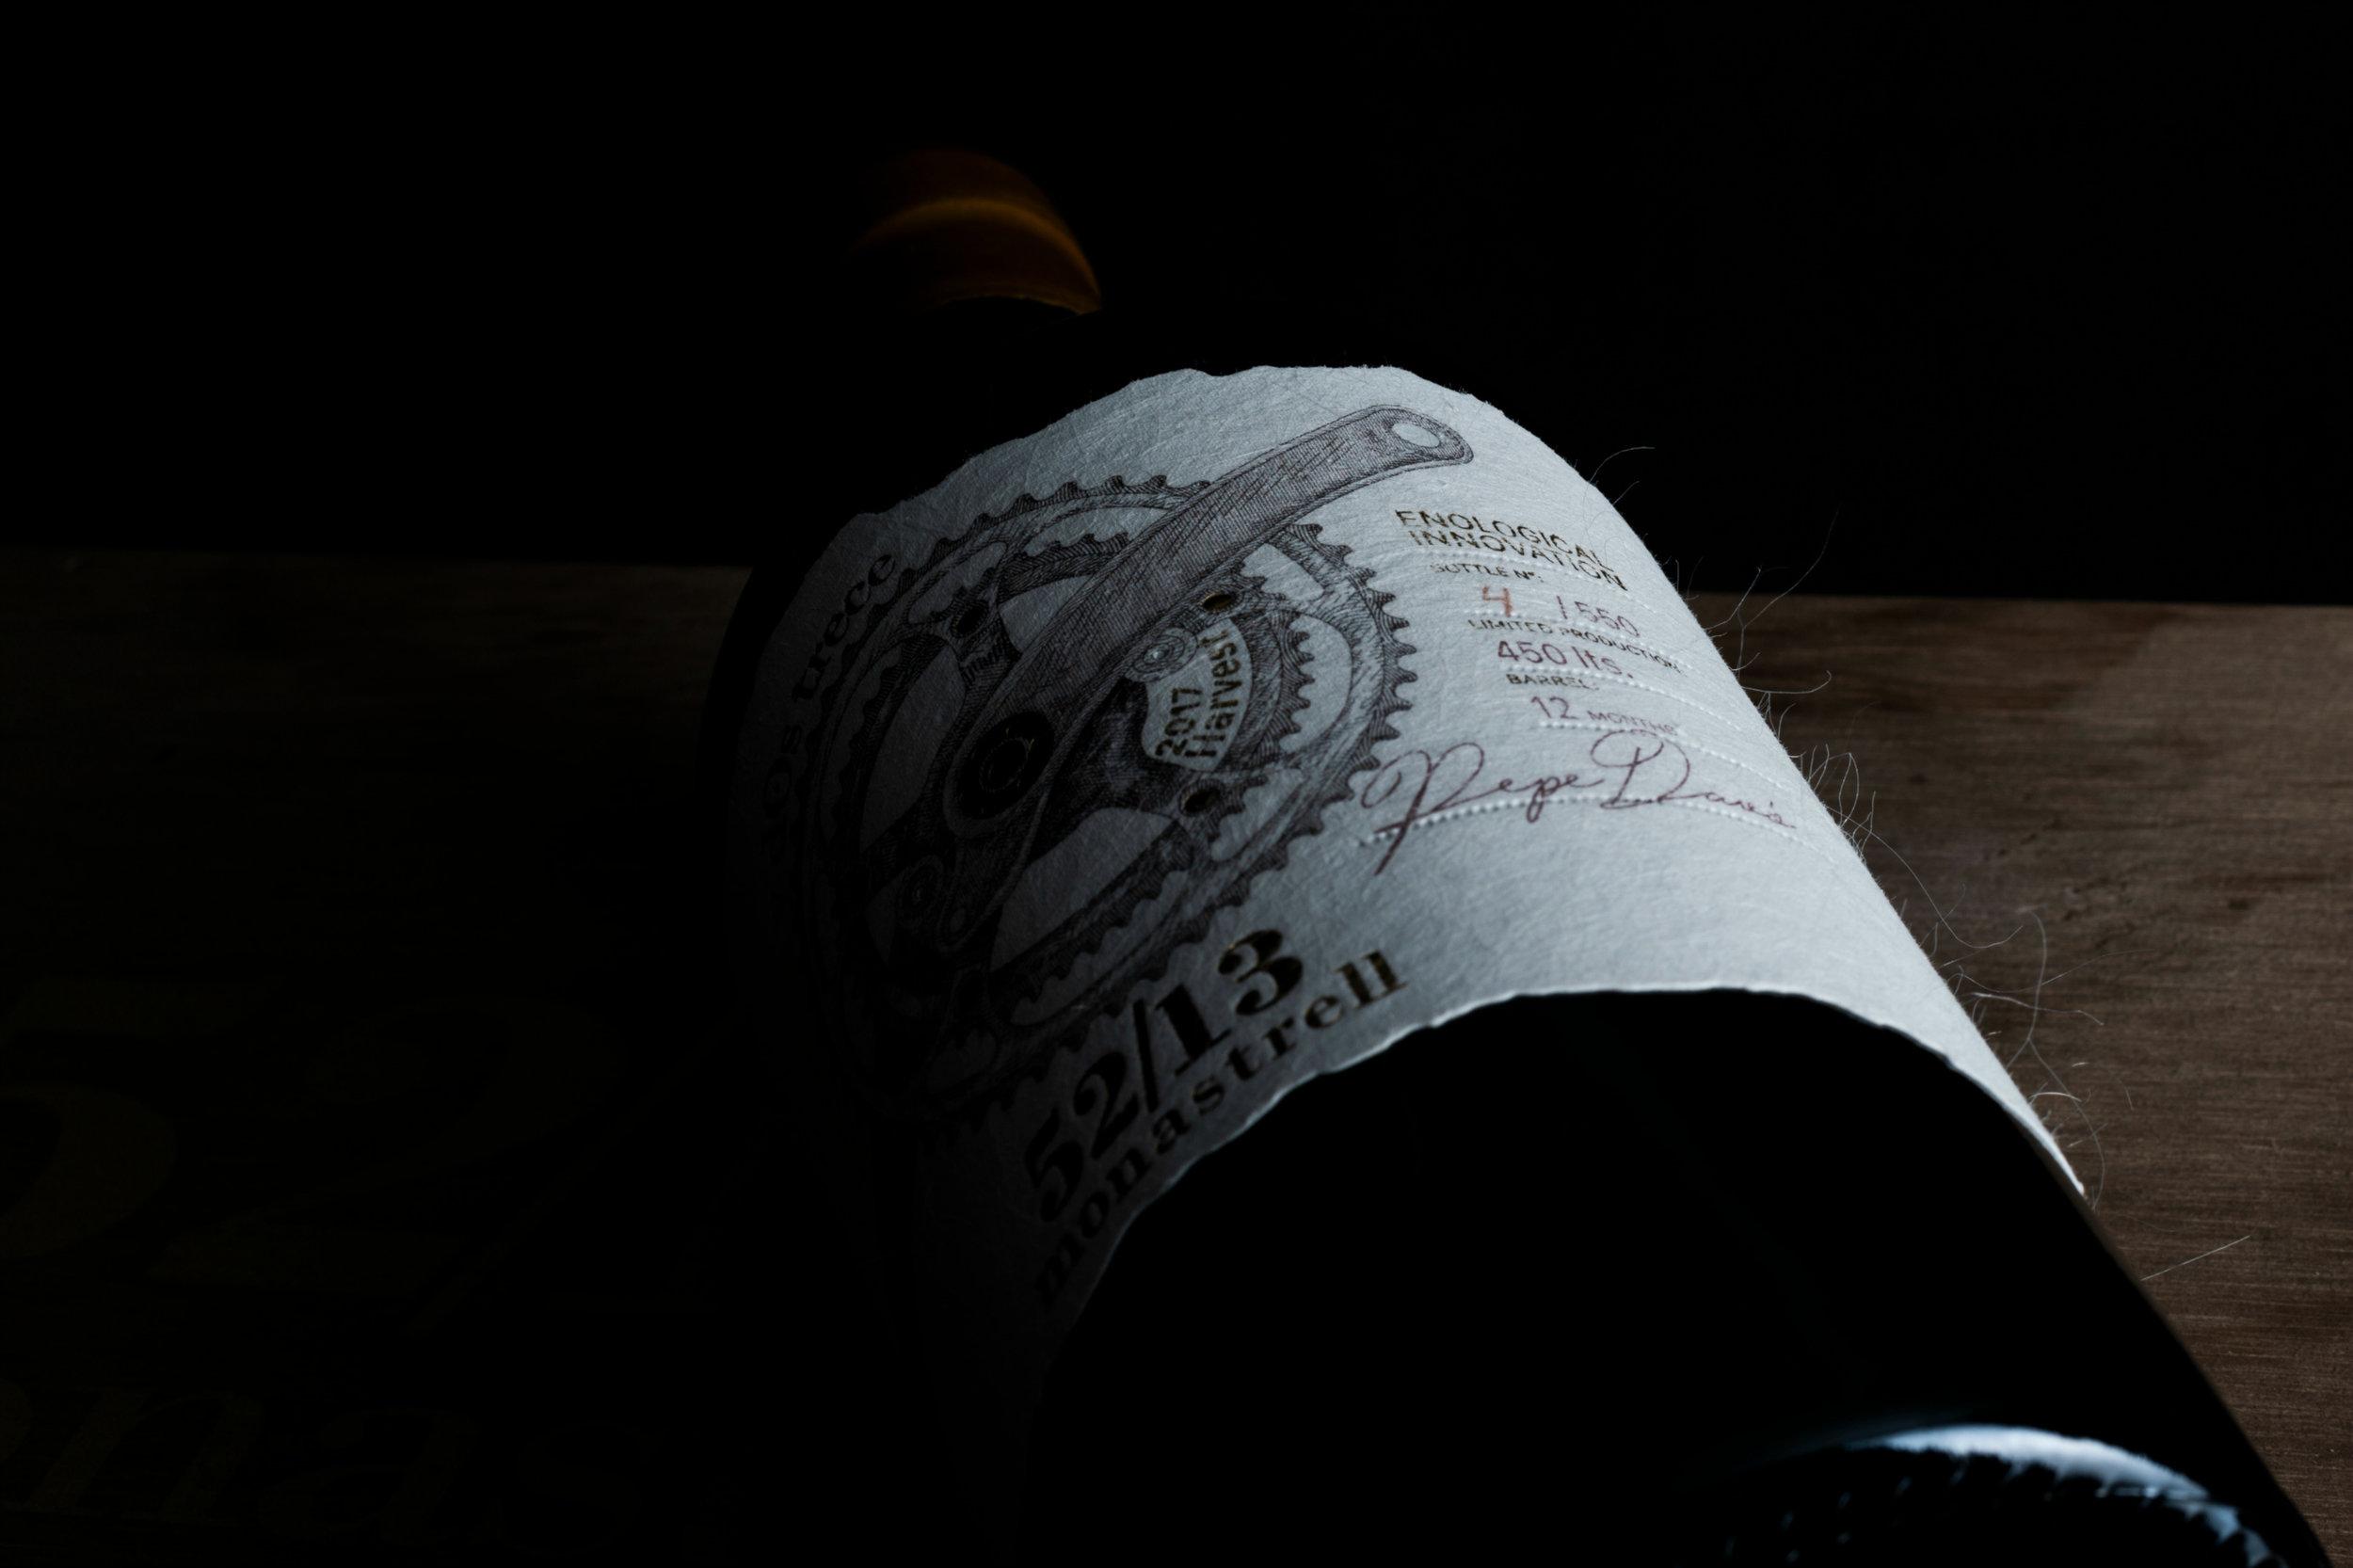 Premium Packaging Design for Spanish Wine / World Brand & Packaging Design Society